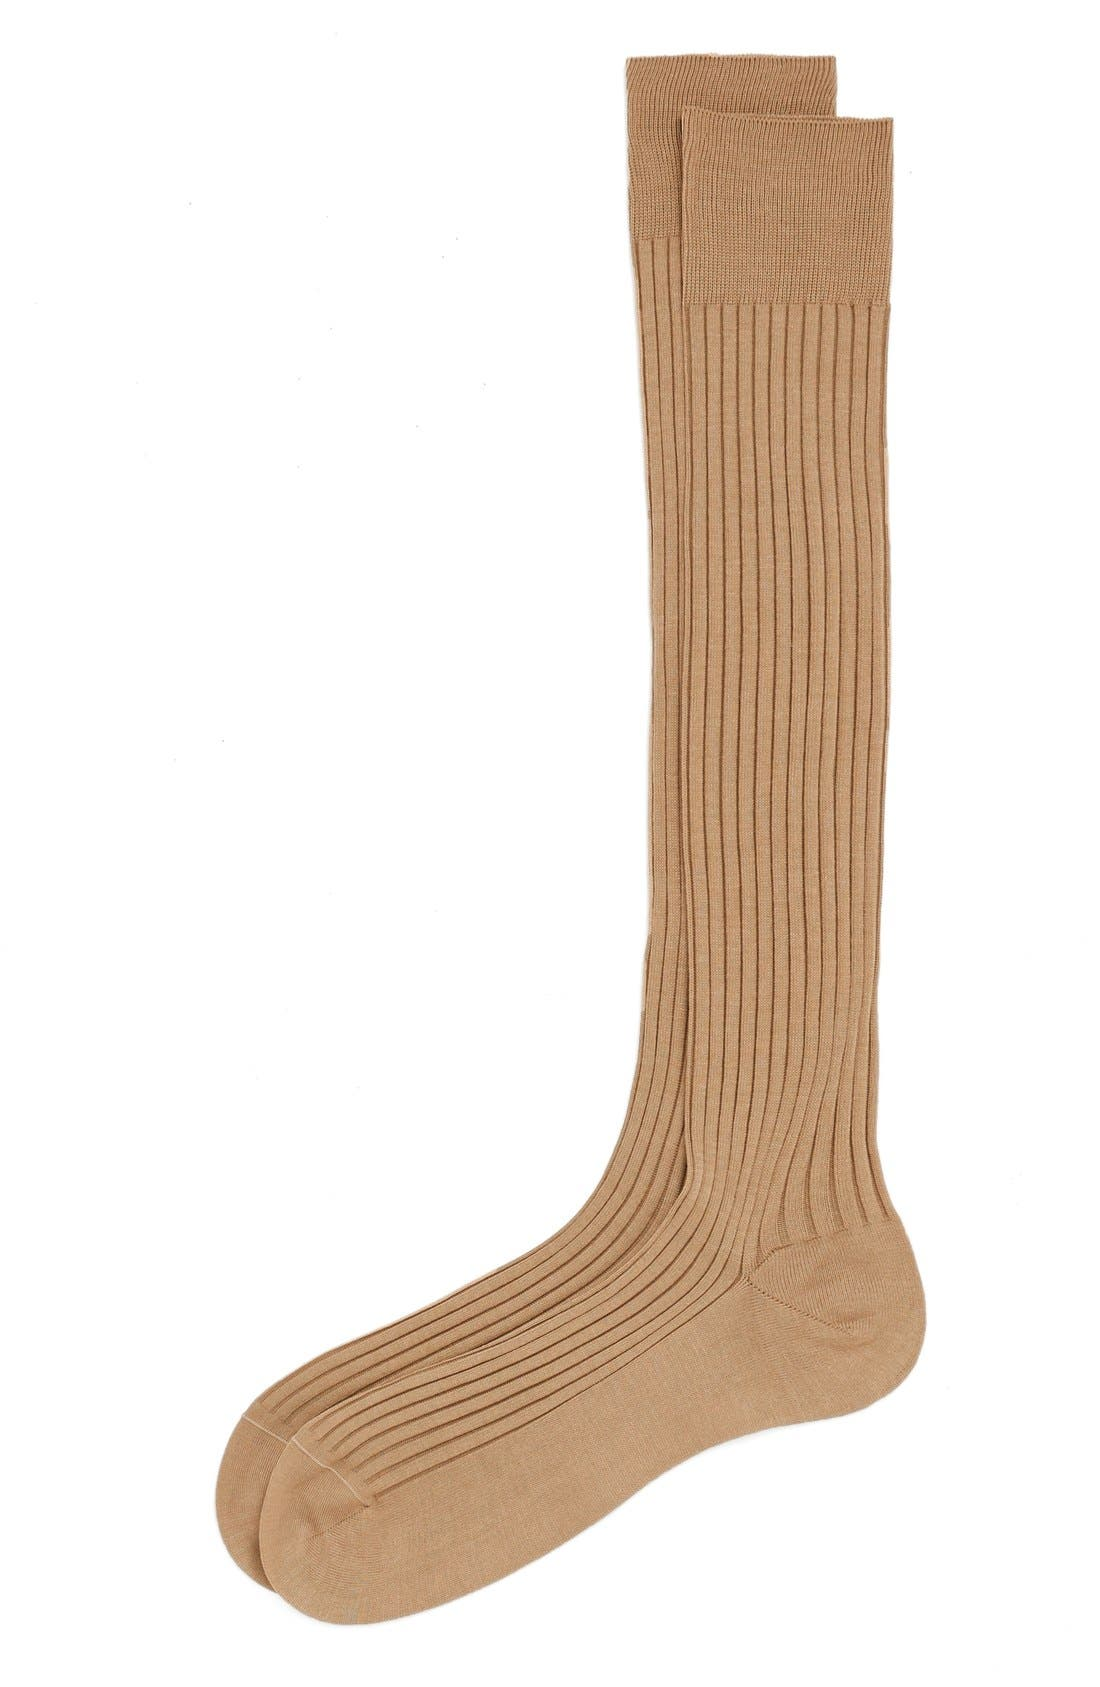 Alternate Image 1 Selected - Pantherella Cotton Lisle Blend Over the Calf Socks